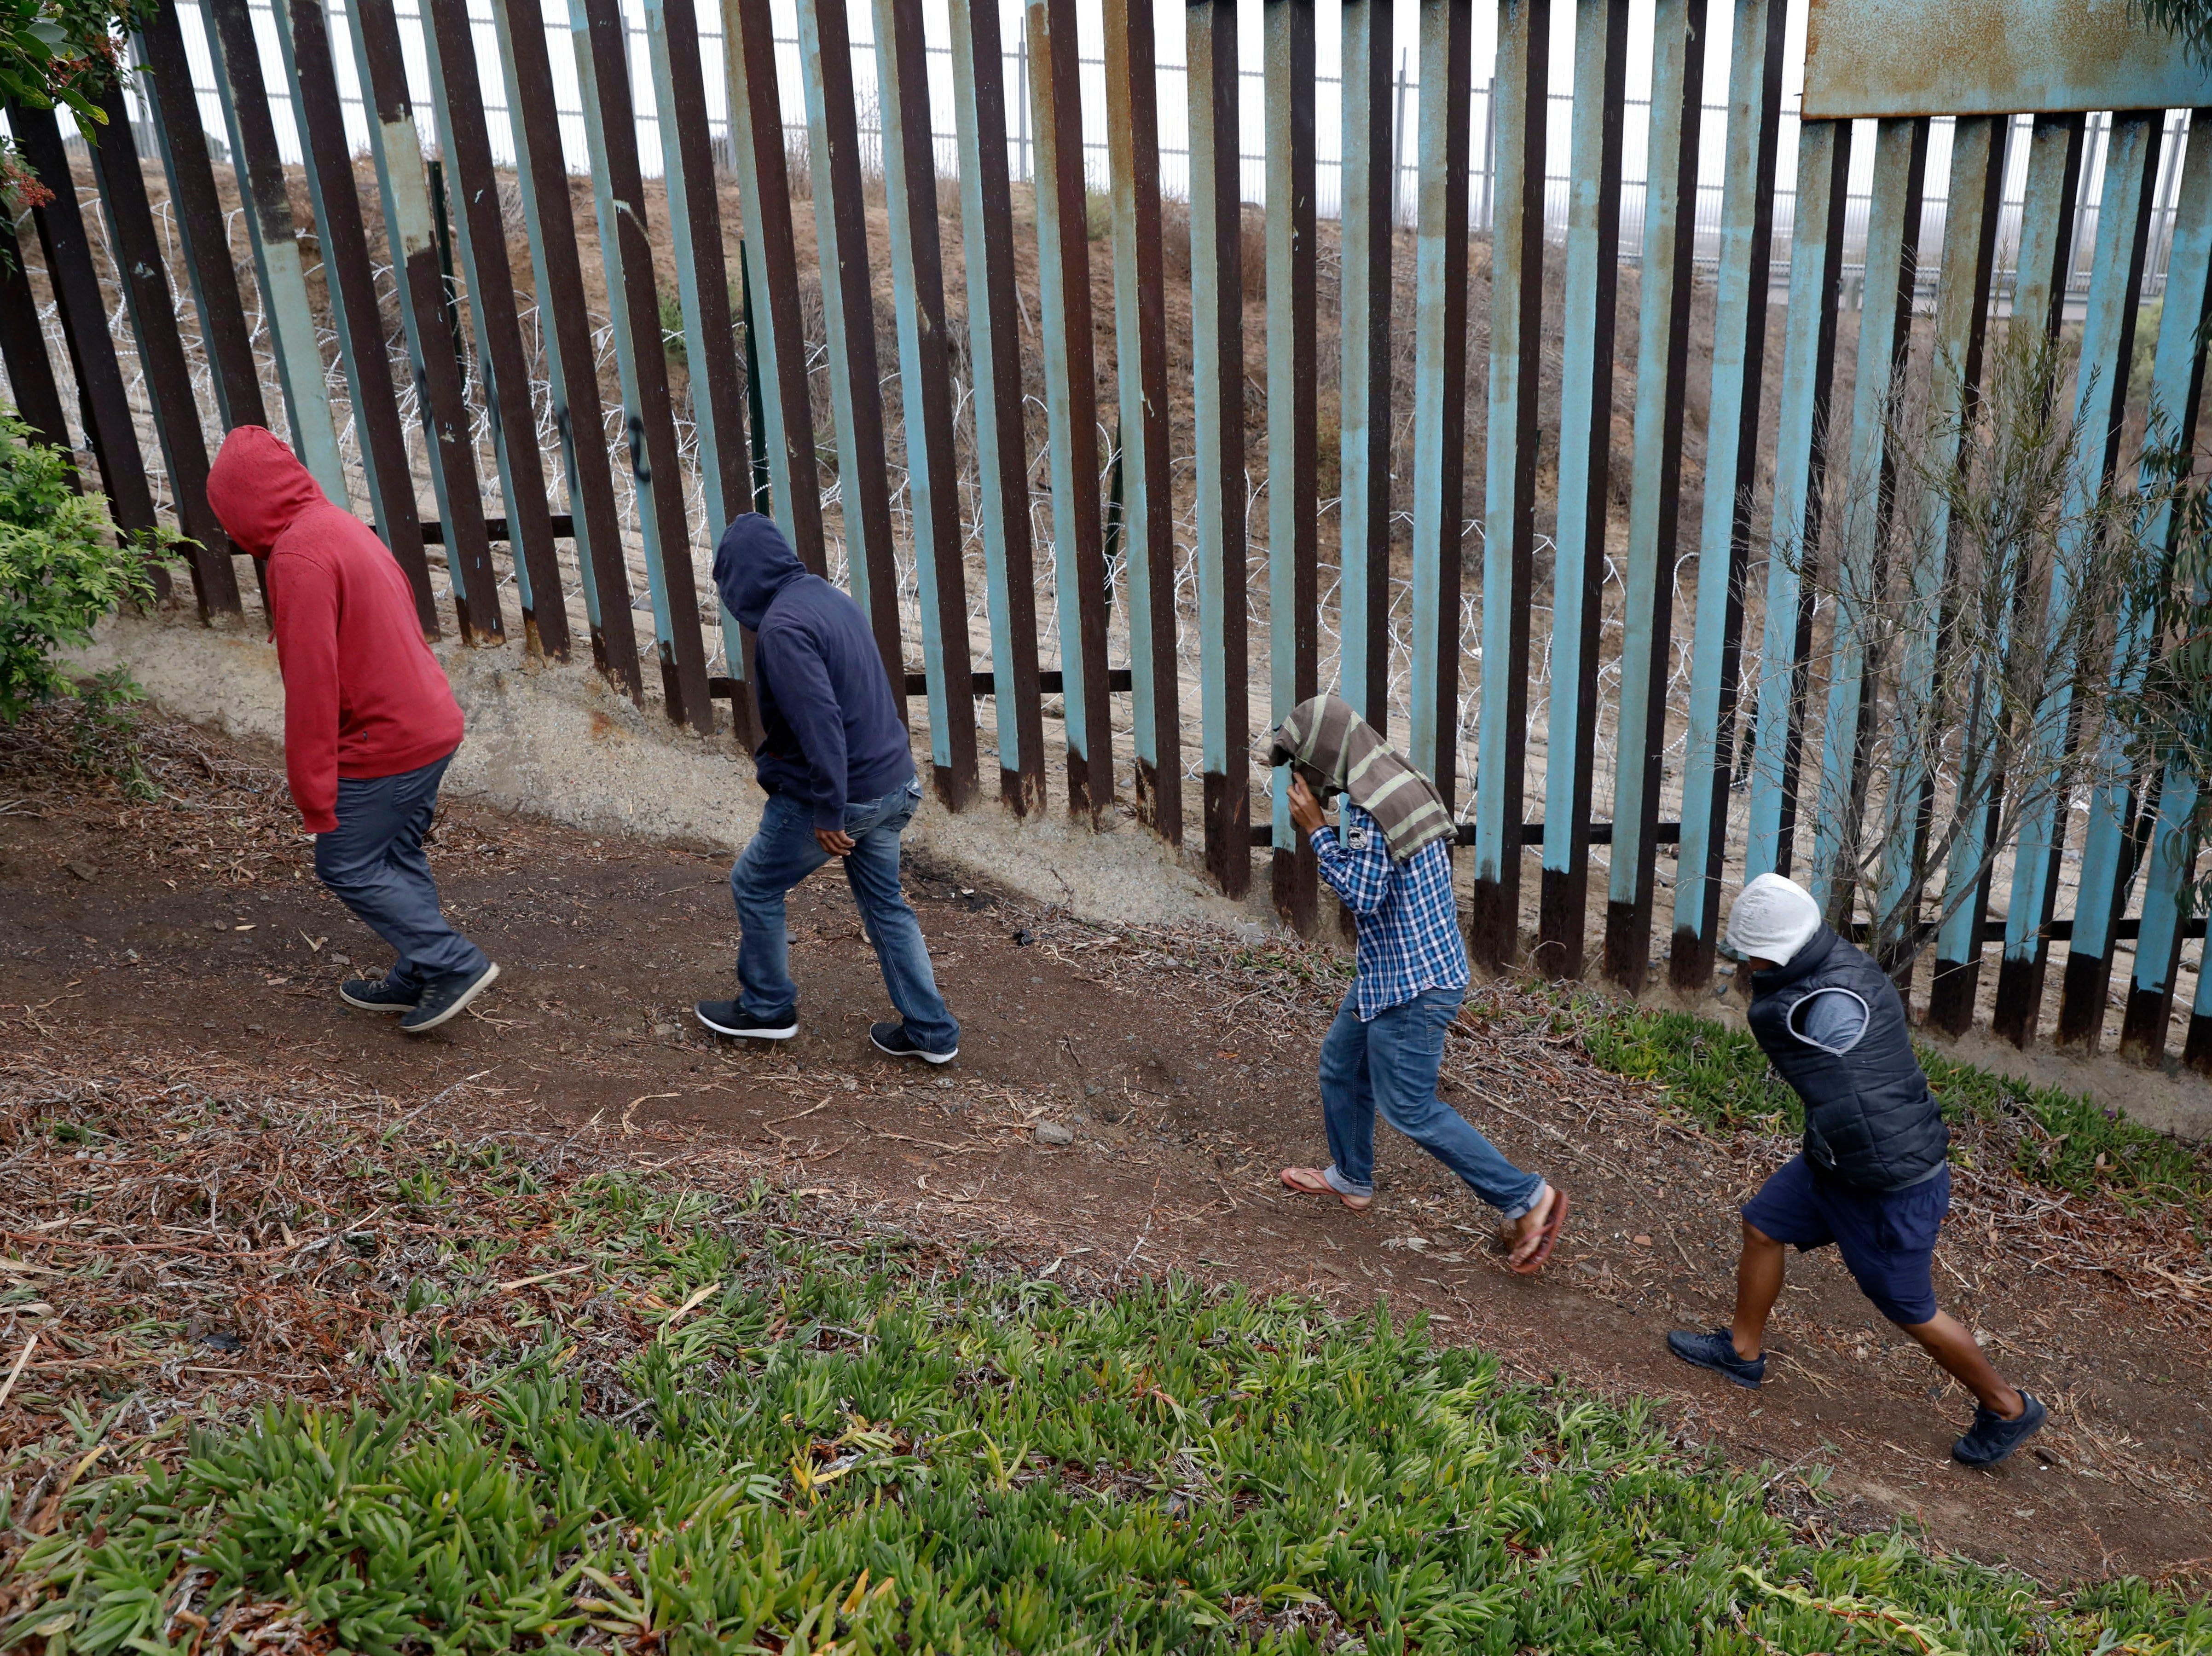 READER: Trump manufactured phony crisis at border